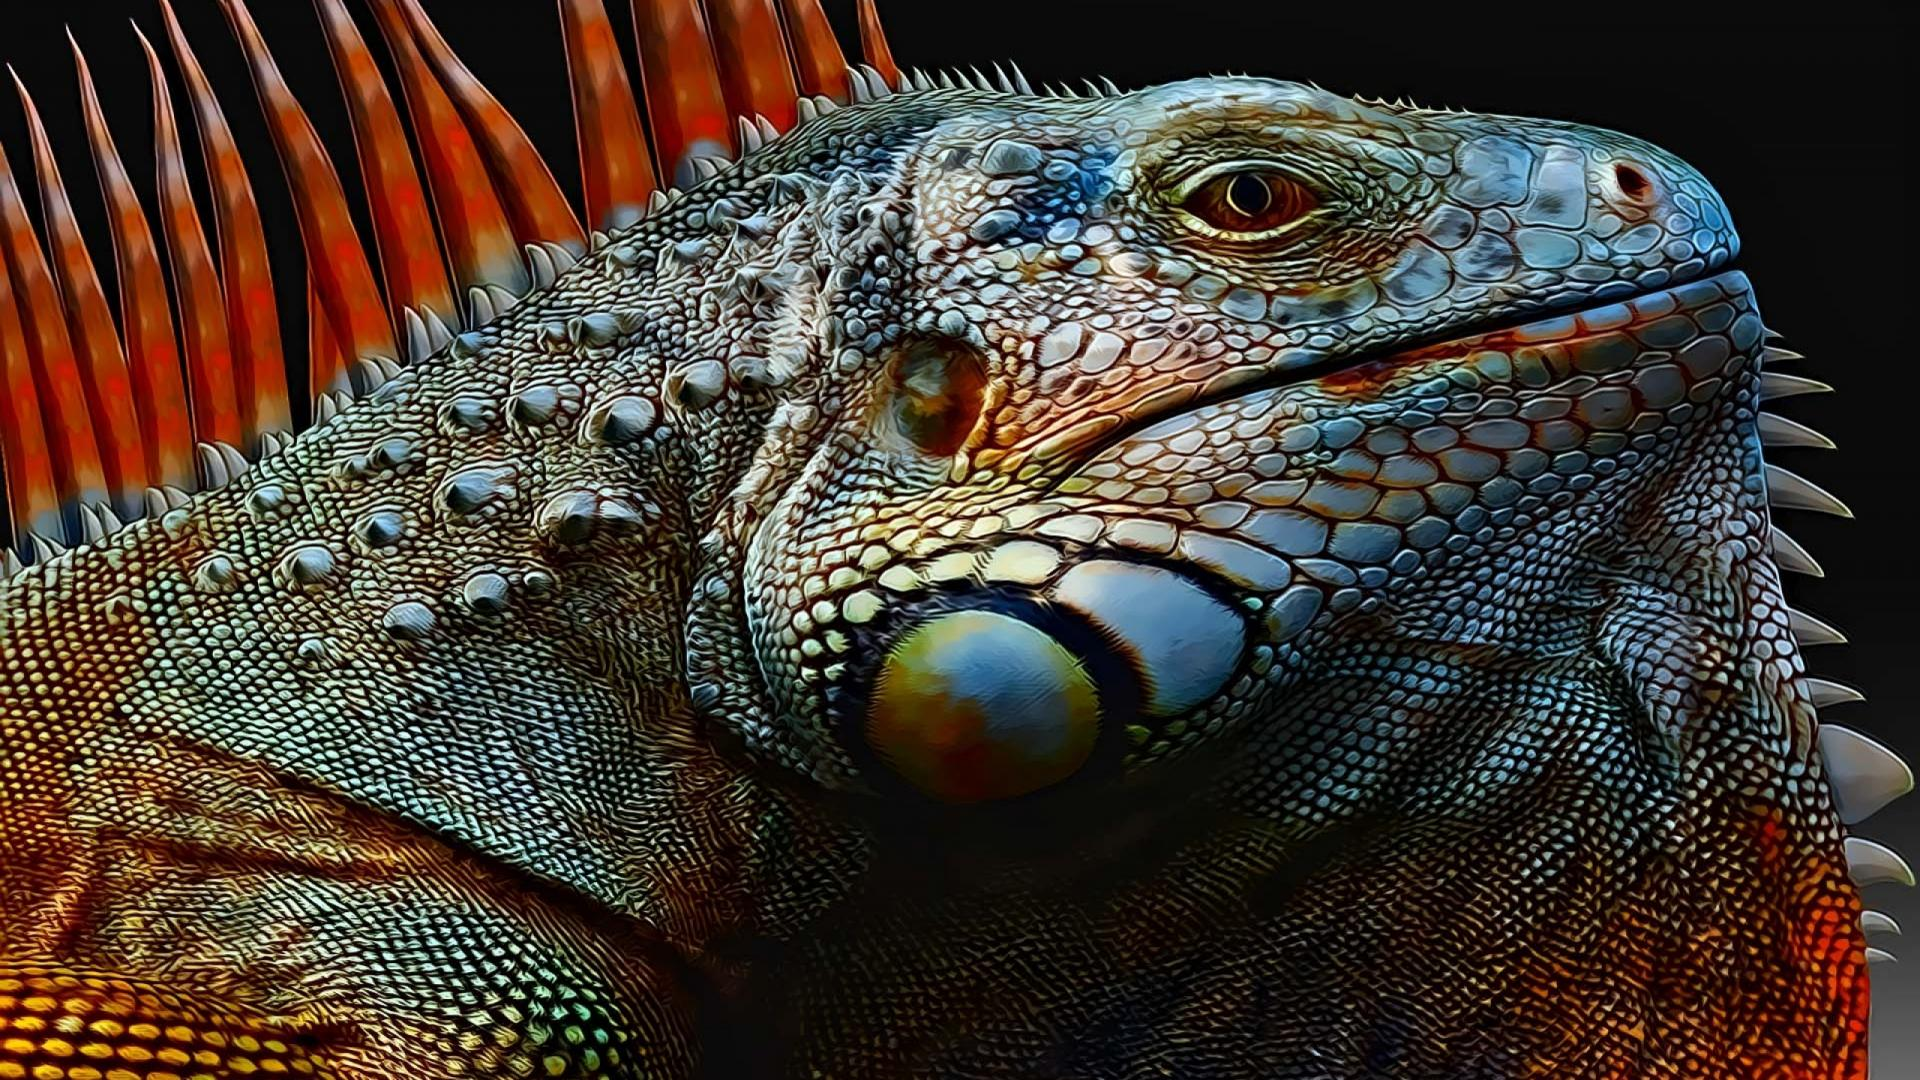 Iguana Wallpaper 1   2560 X 1600 stmednet 1920x1080